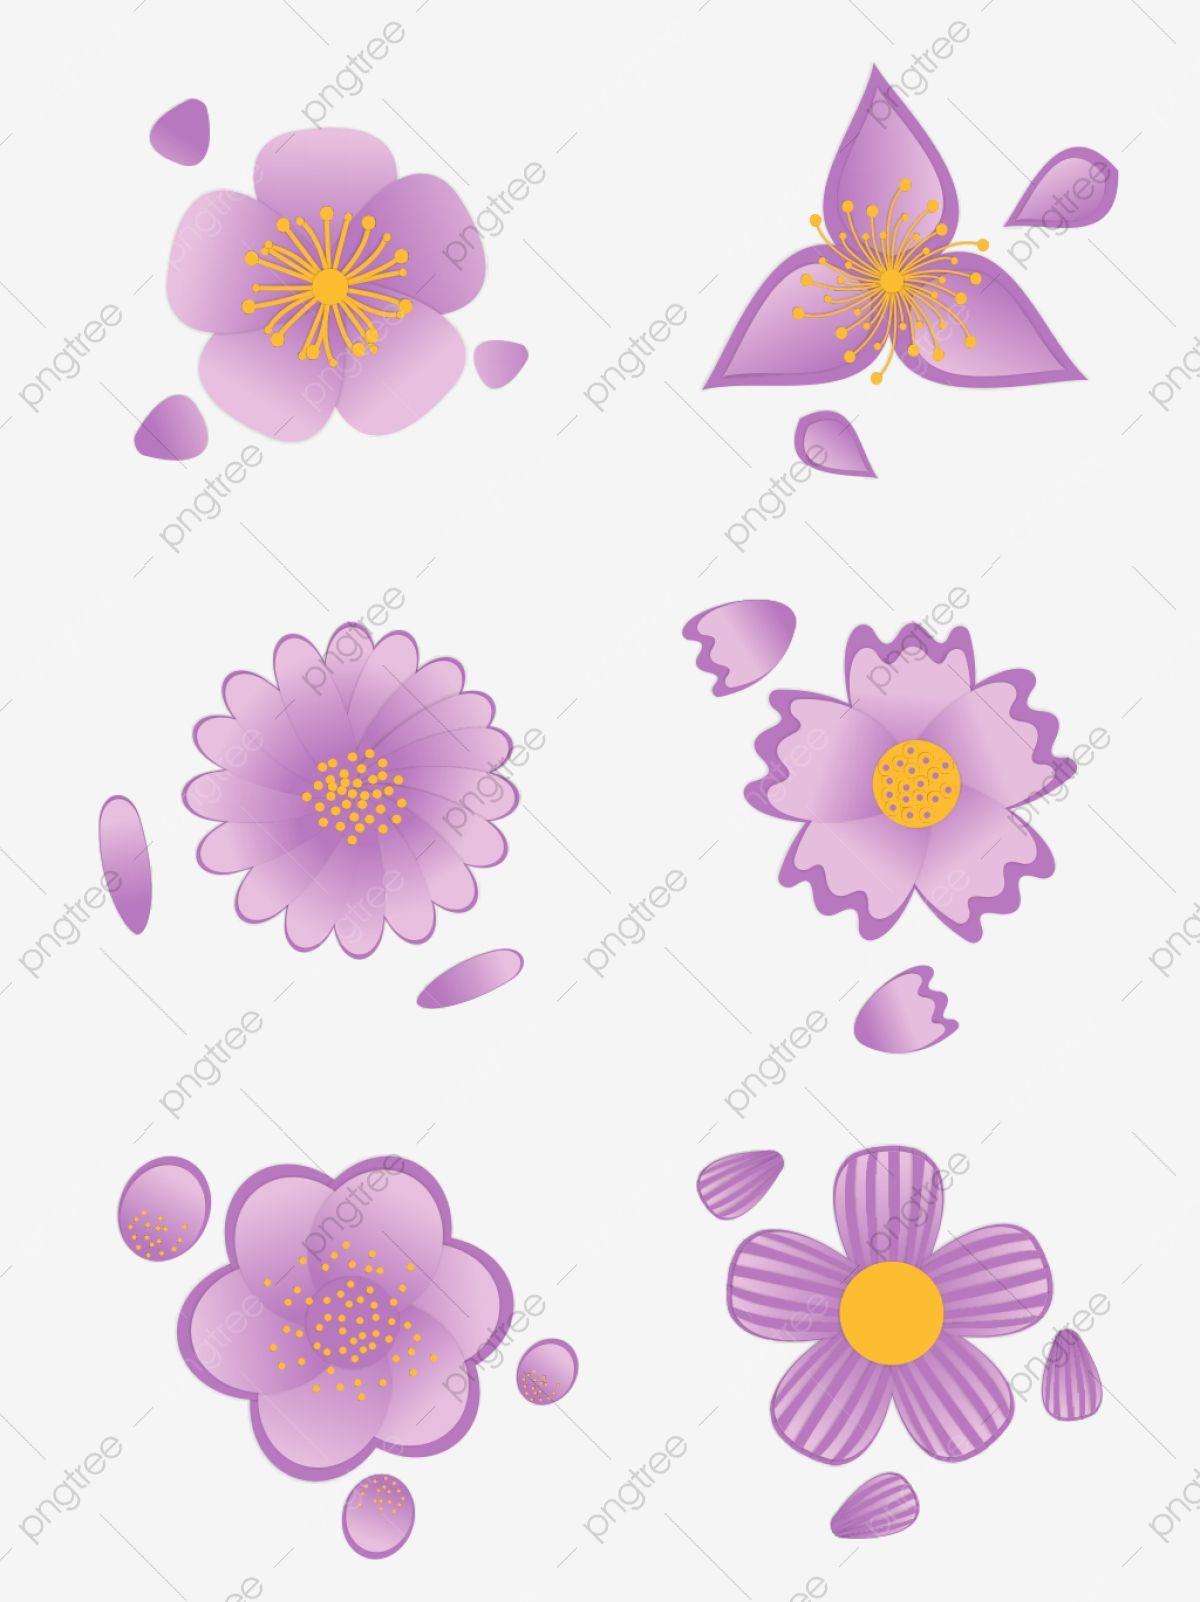 Gambar Bunga Kartun Yang Indah Ungu Bunga Bunga Ungu